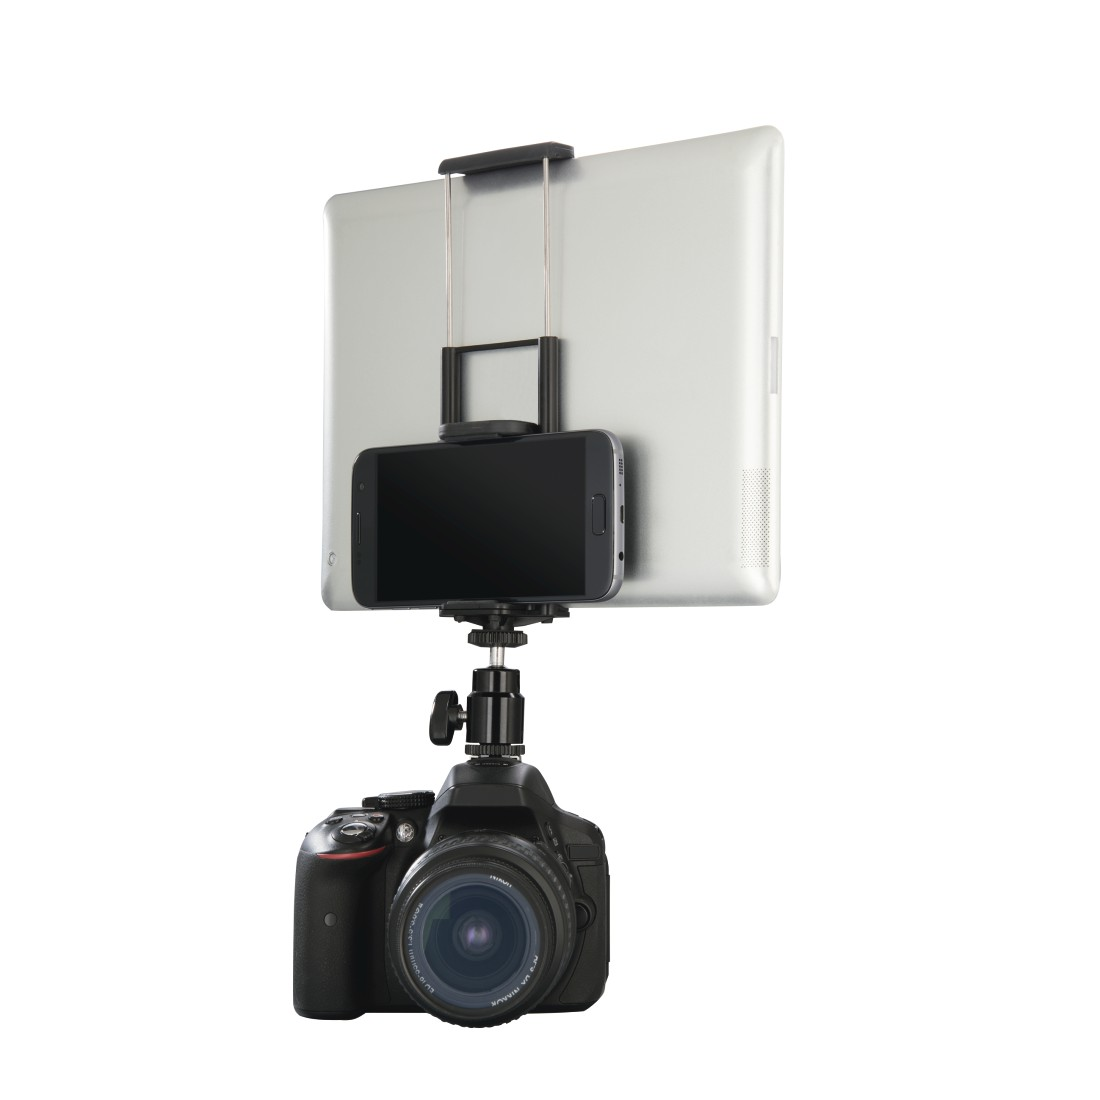 00004625 hama smartphone tablethalterung f r blitzschuh und an dslr mit wifi hama de. Black Bedroom Furniture Sets. Home Design Ideas